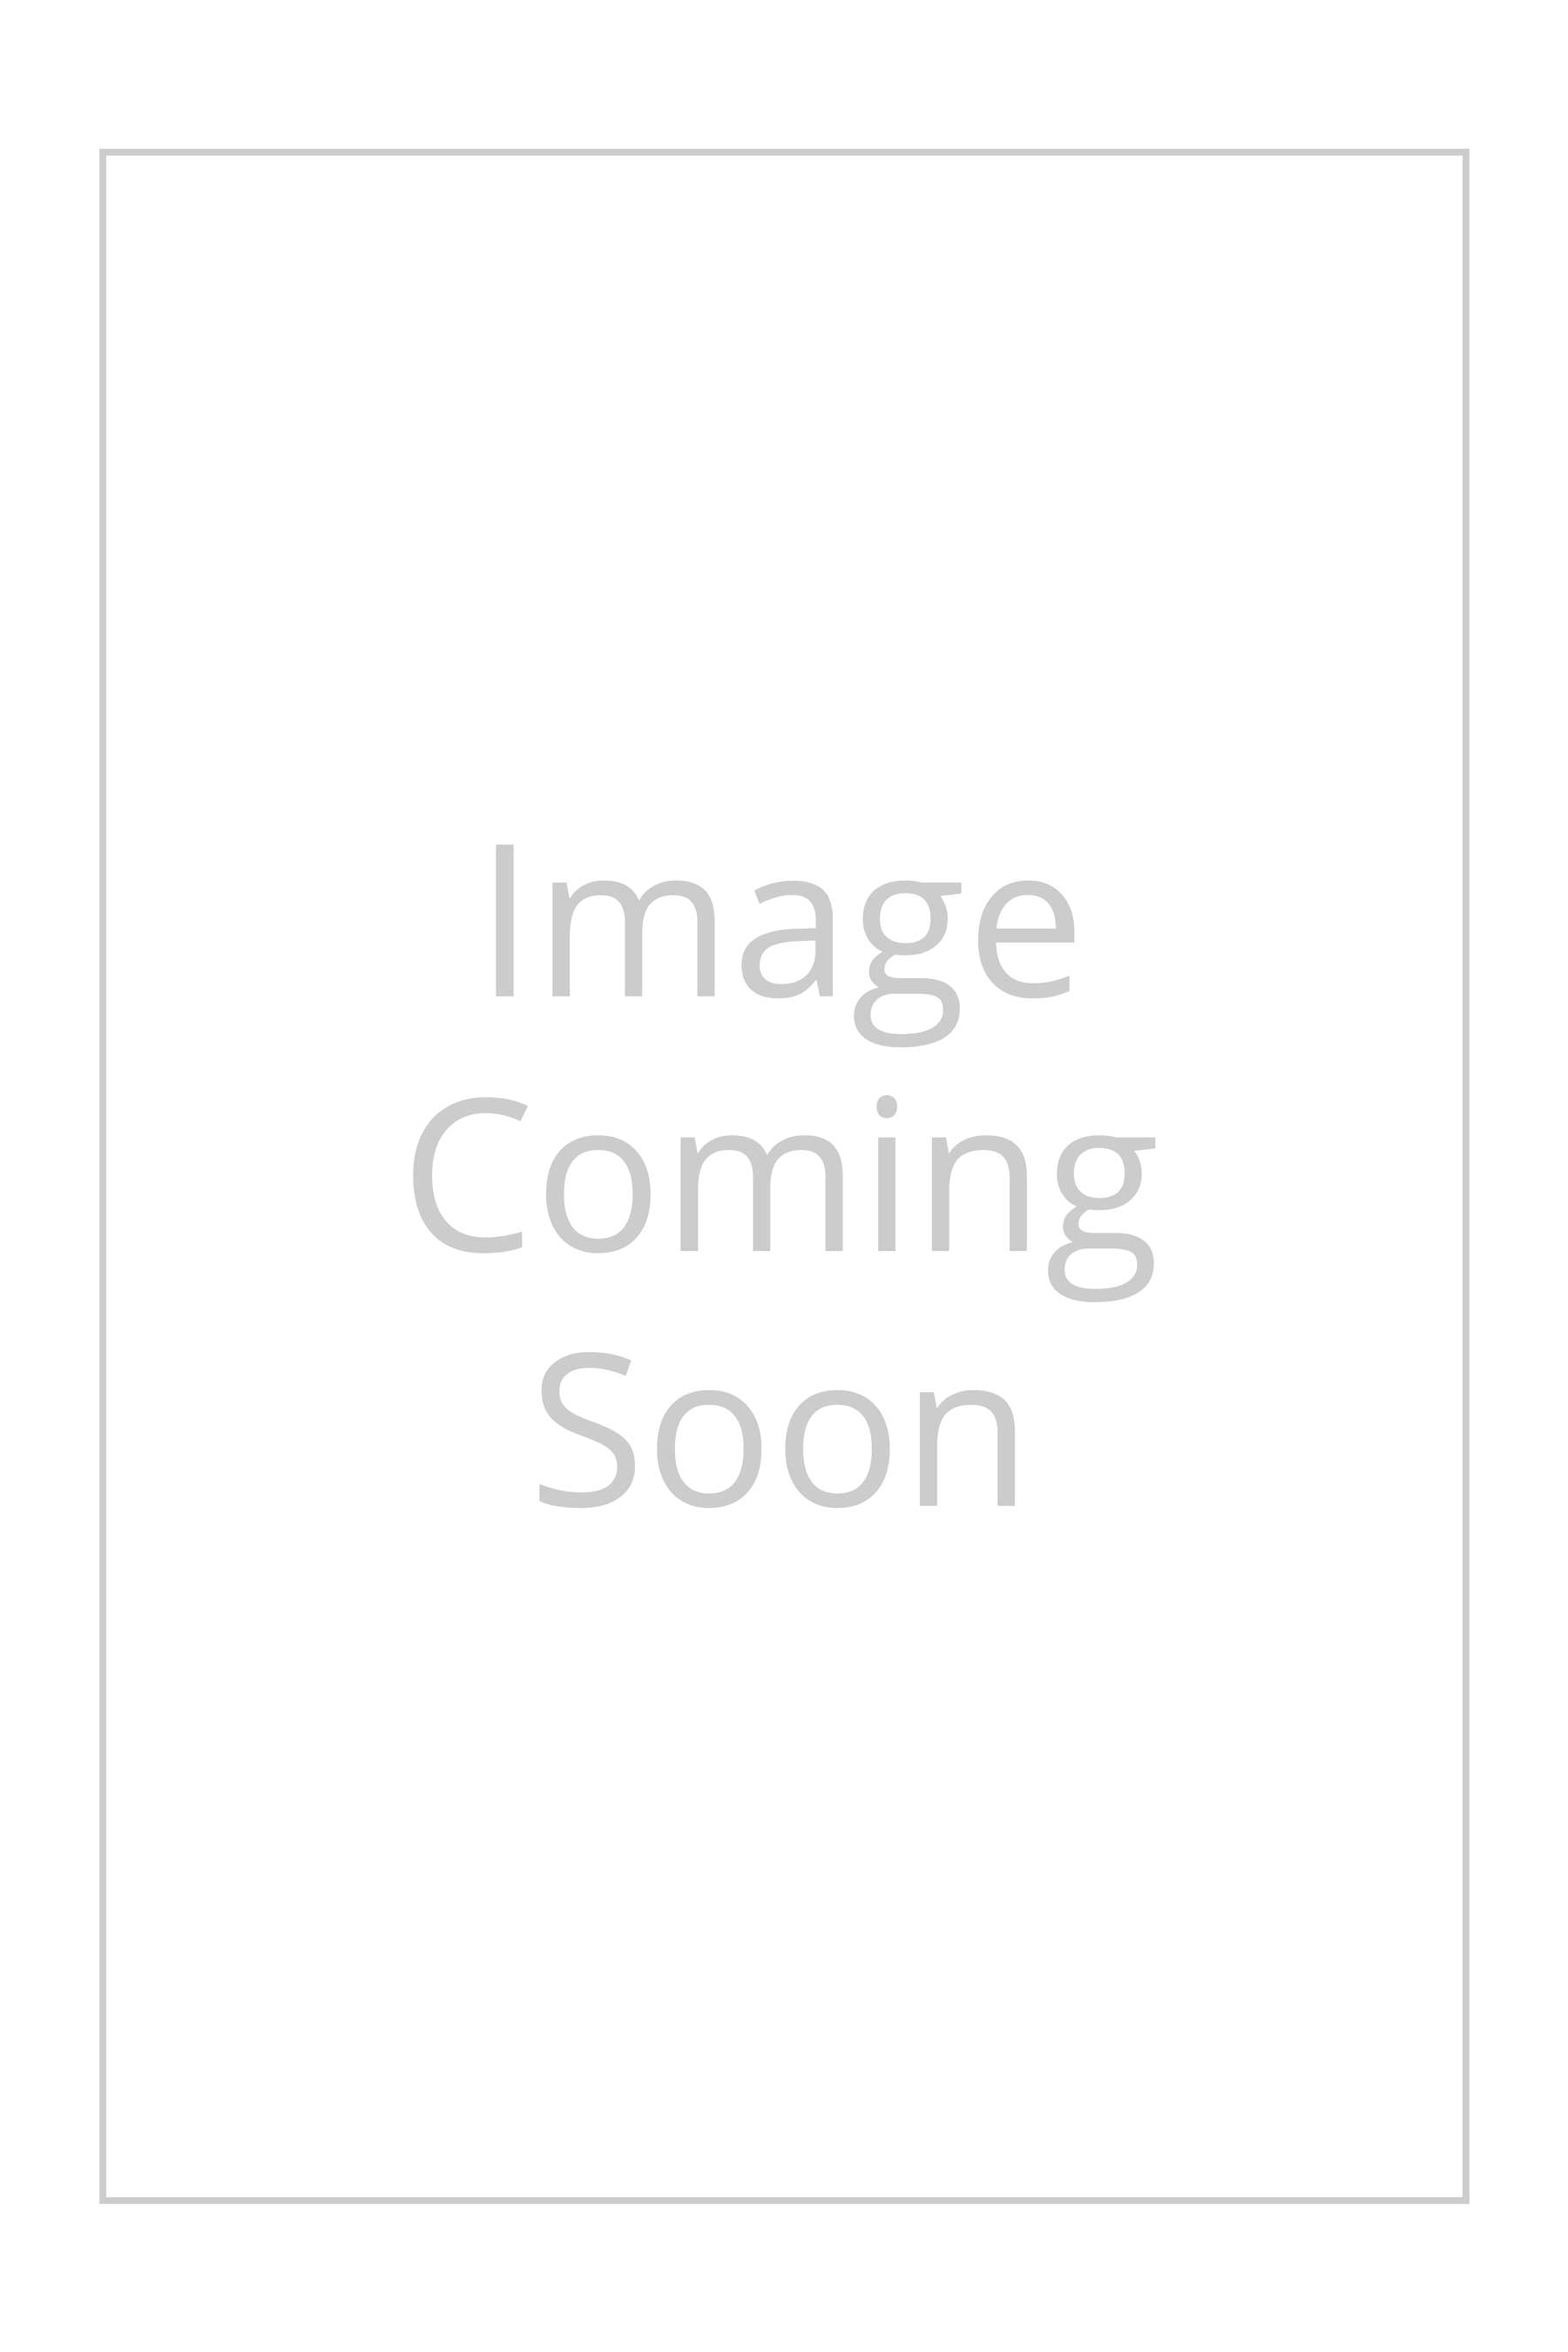 St. John Signature Black Enameled Pearl Brooch w/ Beaded Chain